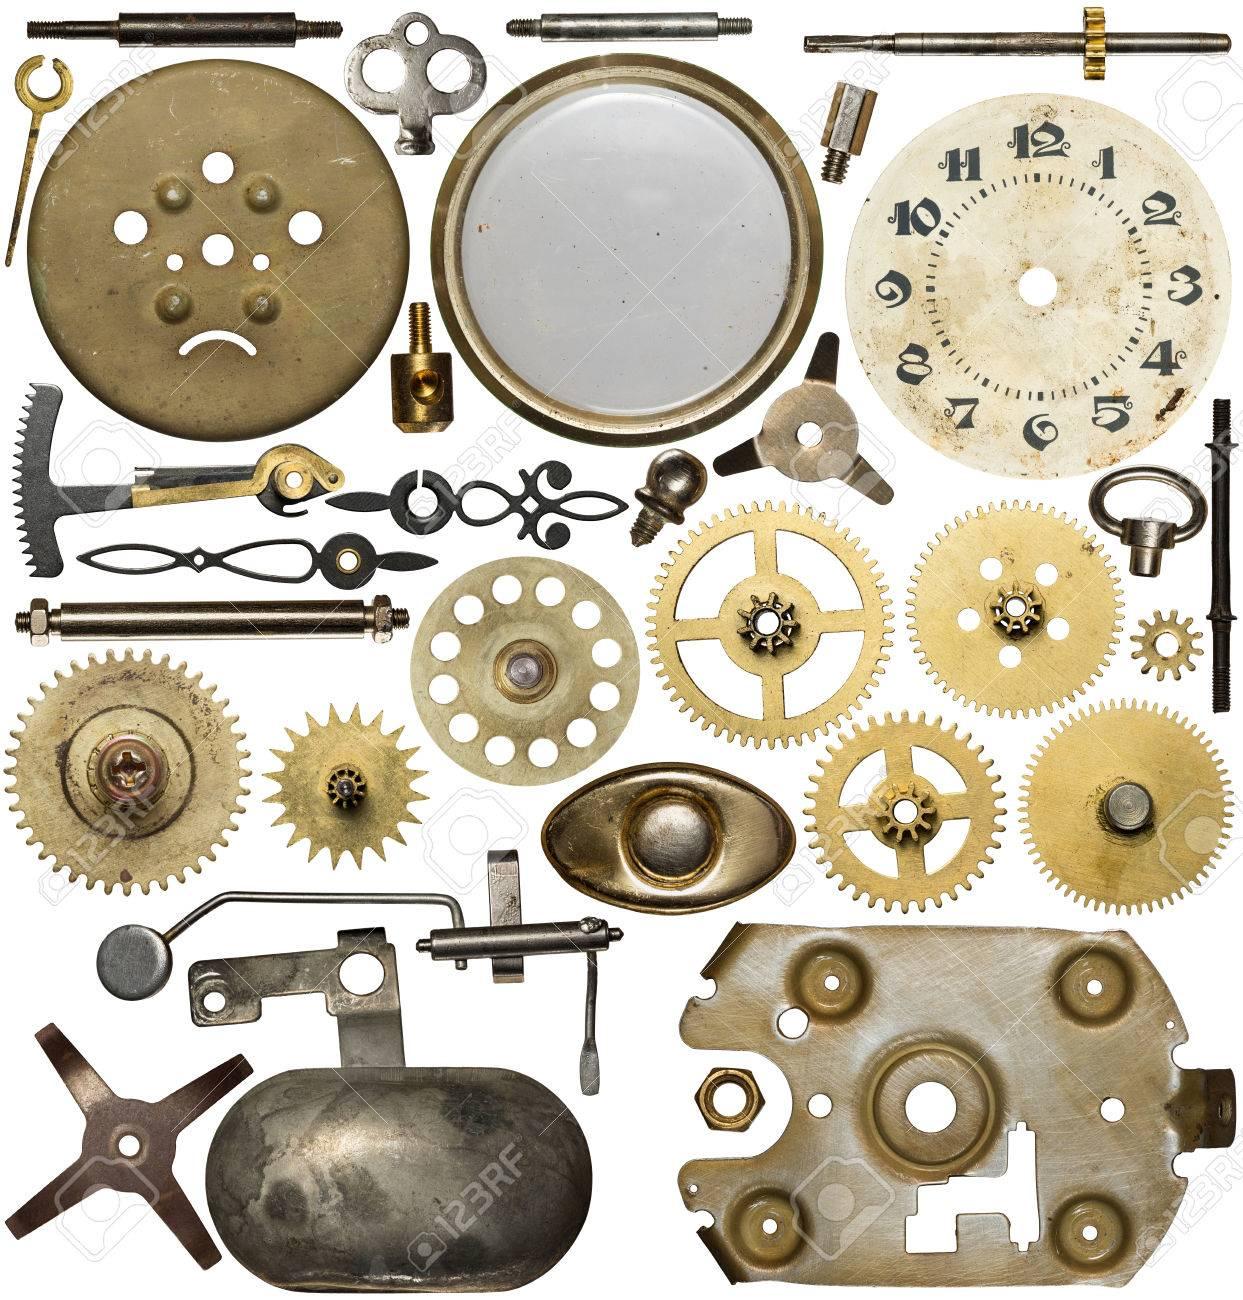 Clockwork spare parts. Metal gear, cogwheels, dial. Stock Photo - 34178876